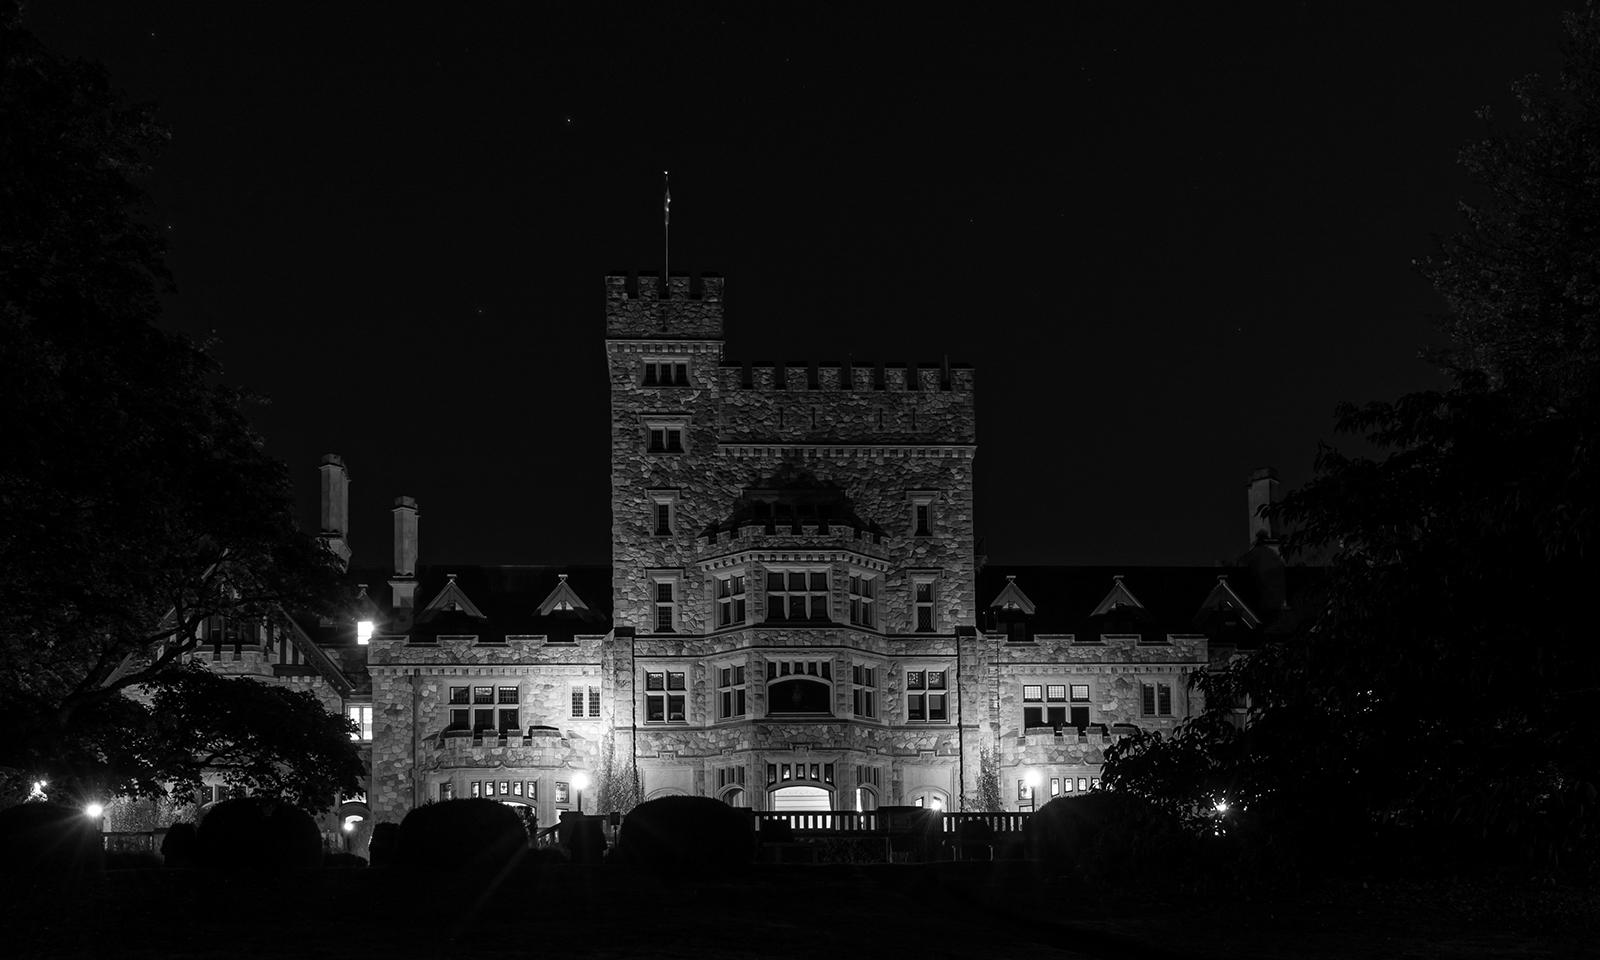 Hatley Castle at night